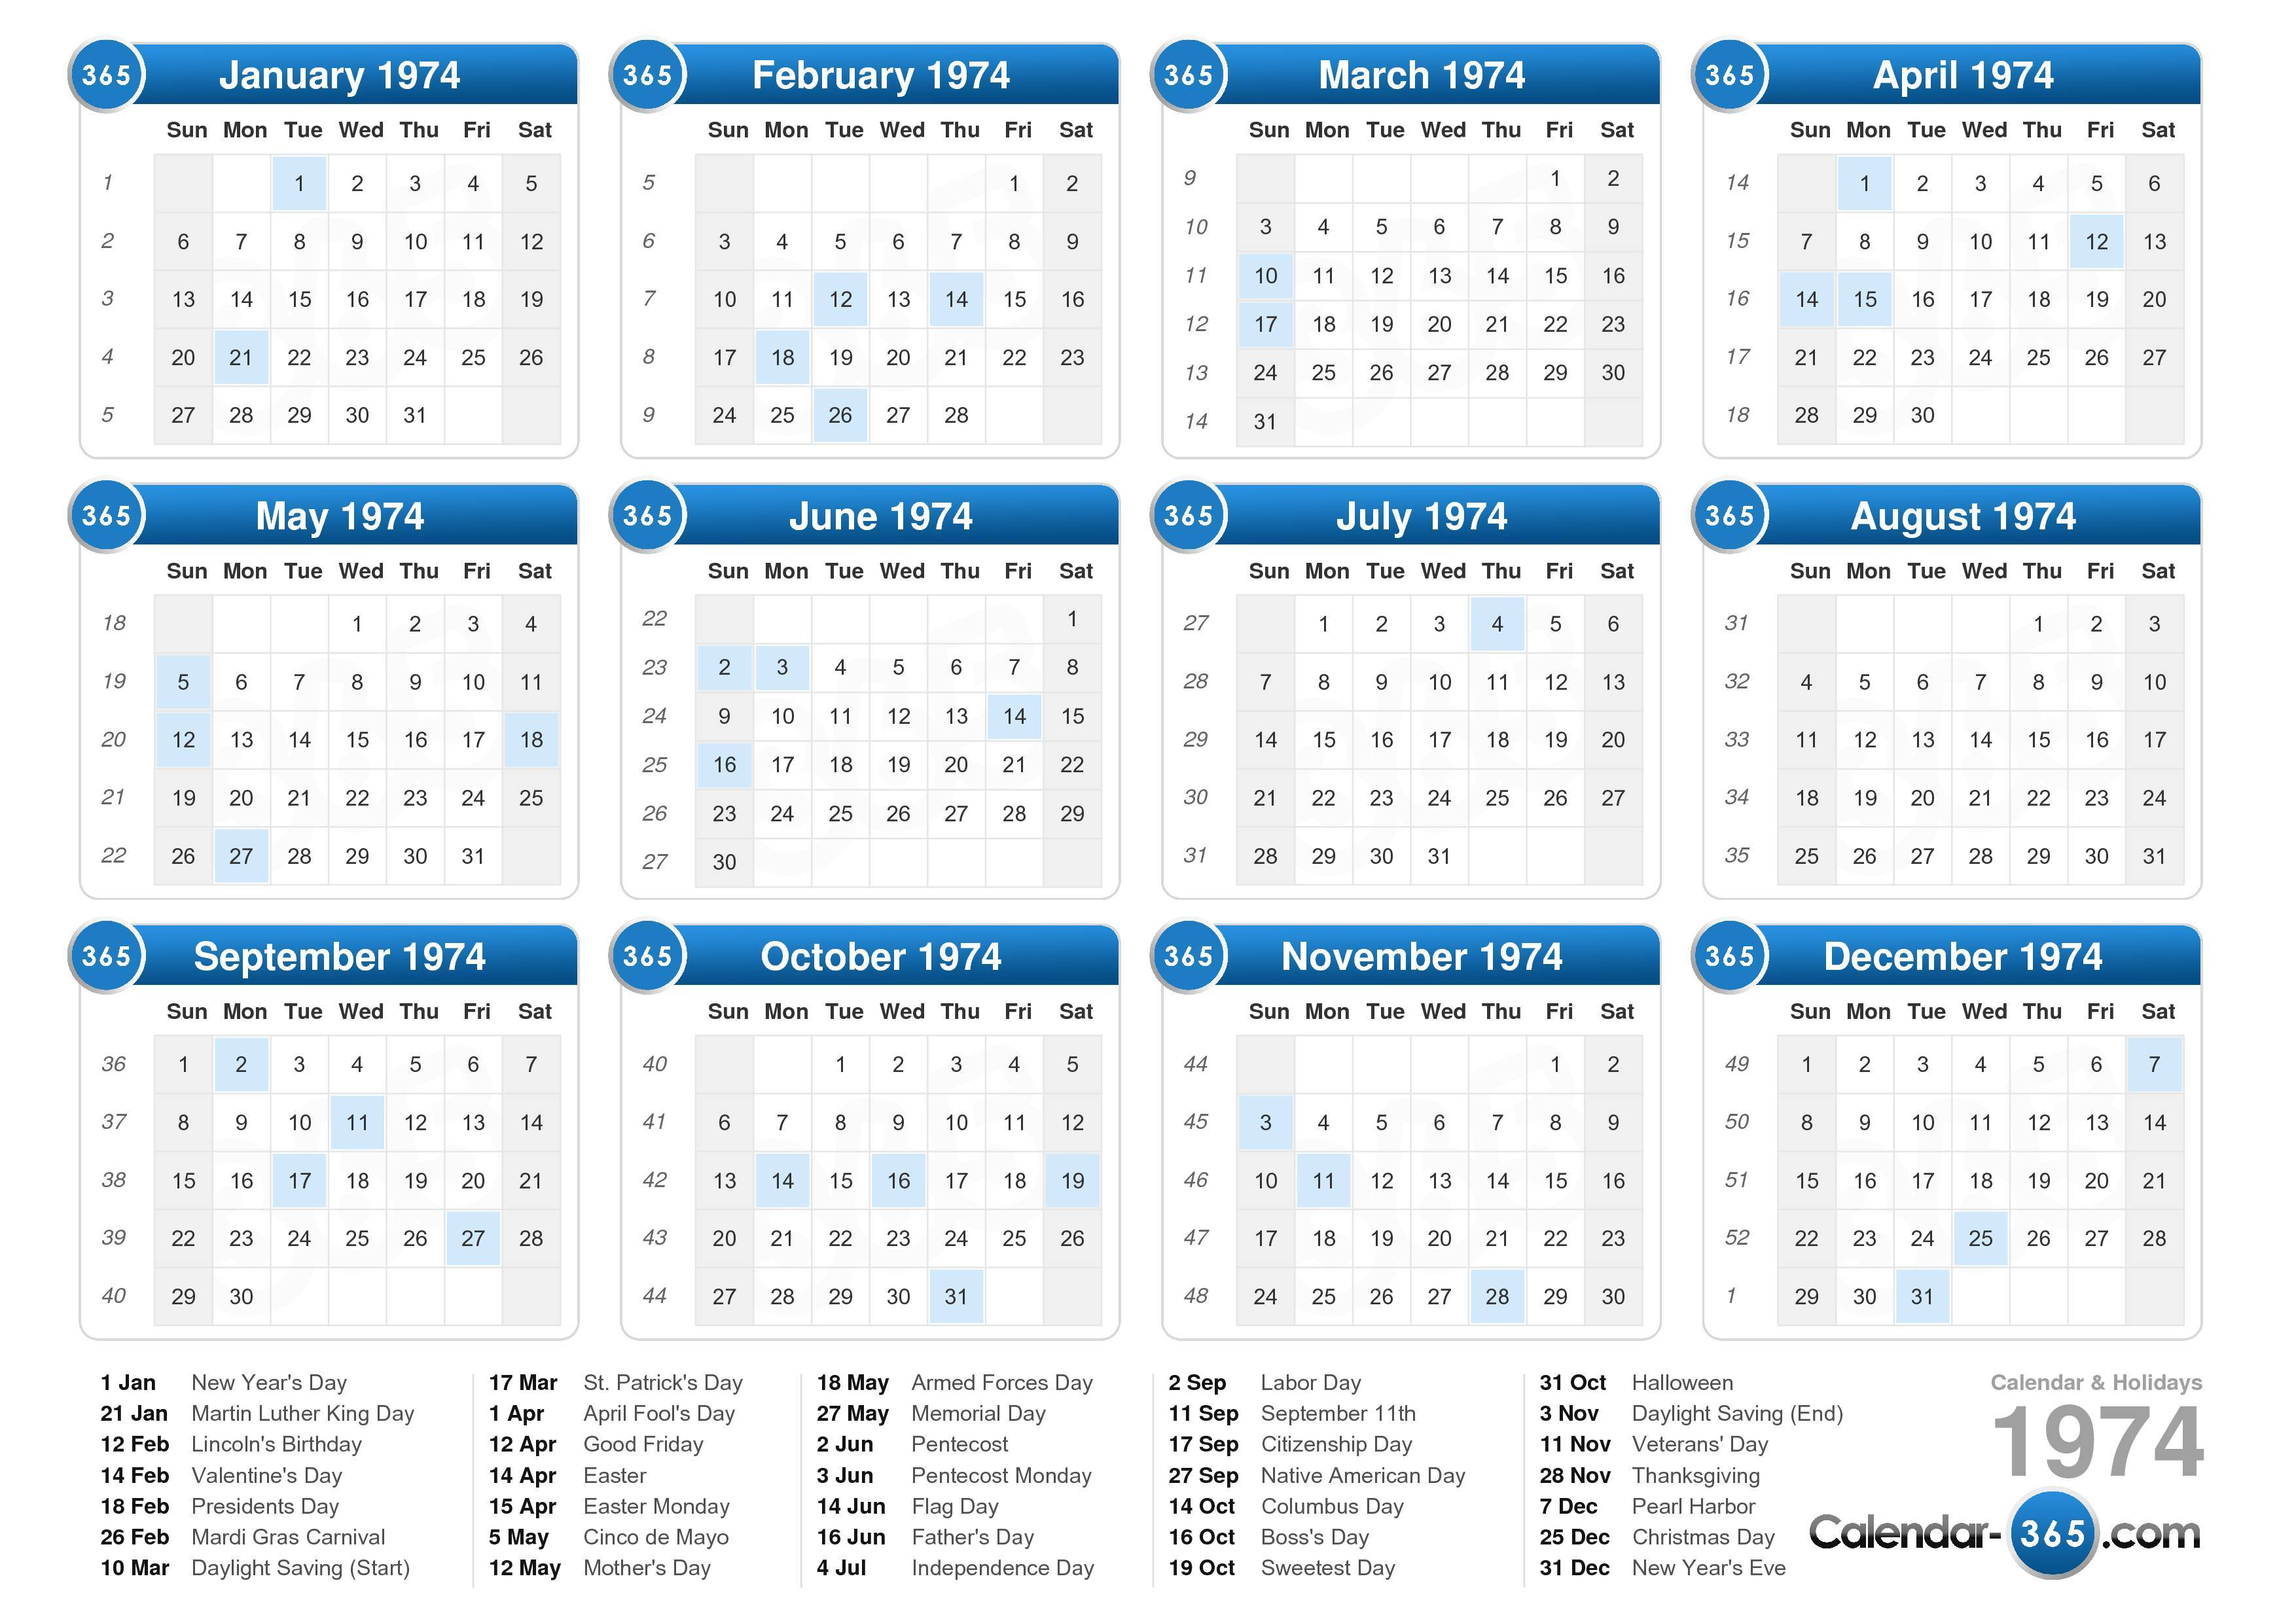 ... calendar with holidays landscape format 1 page 1974 calendar 325 3 407